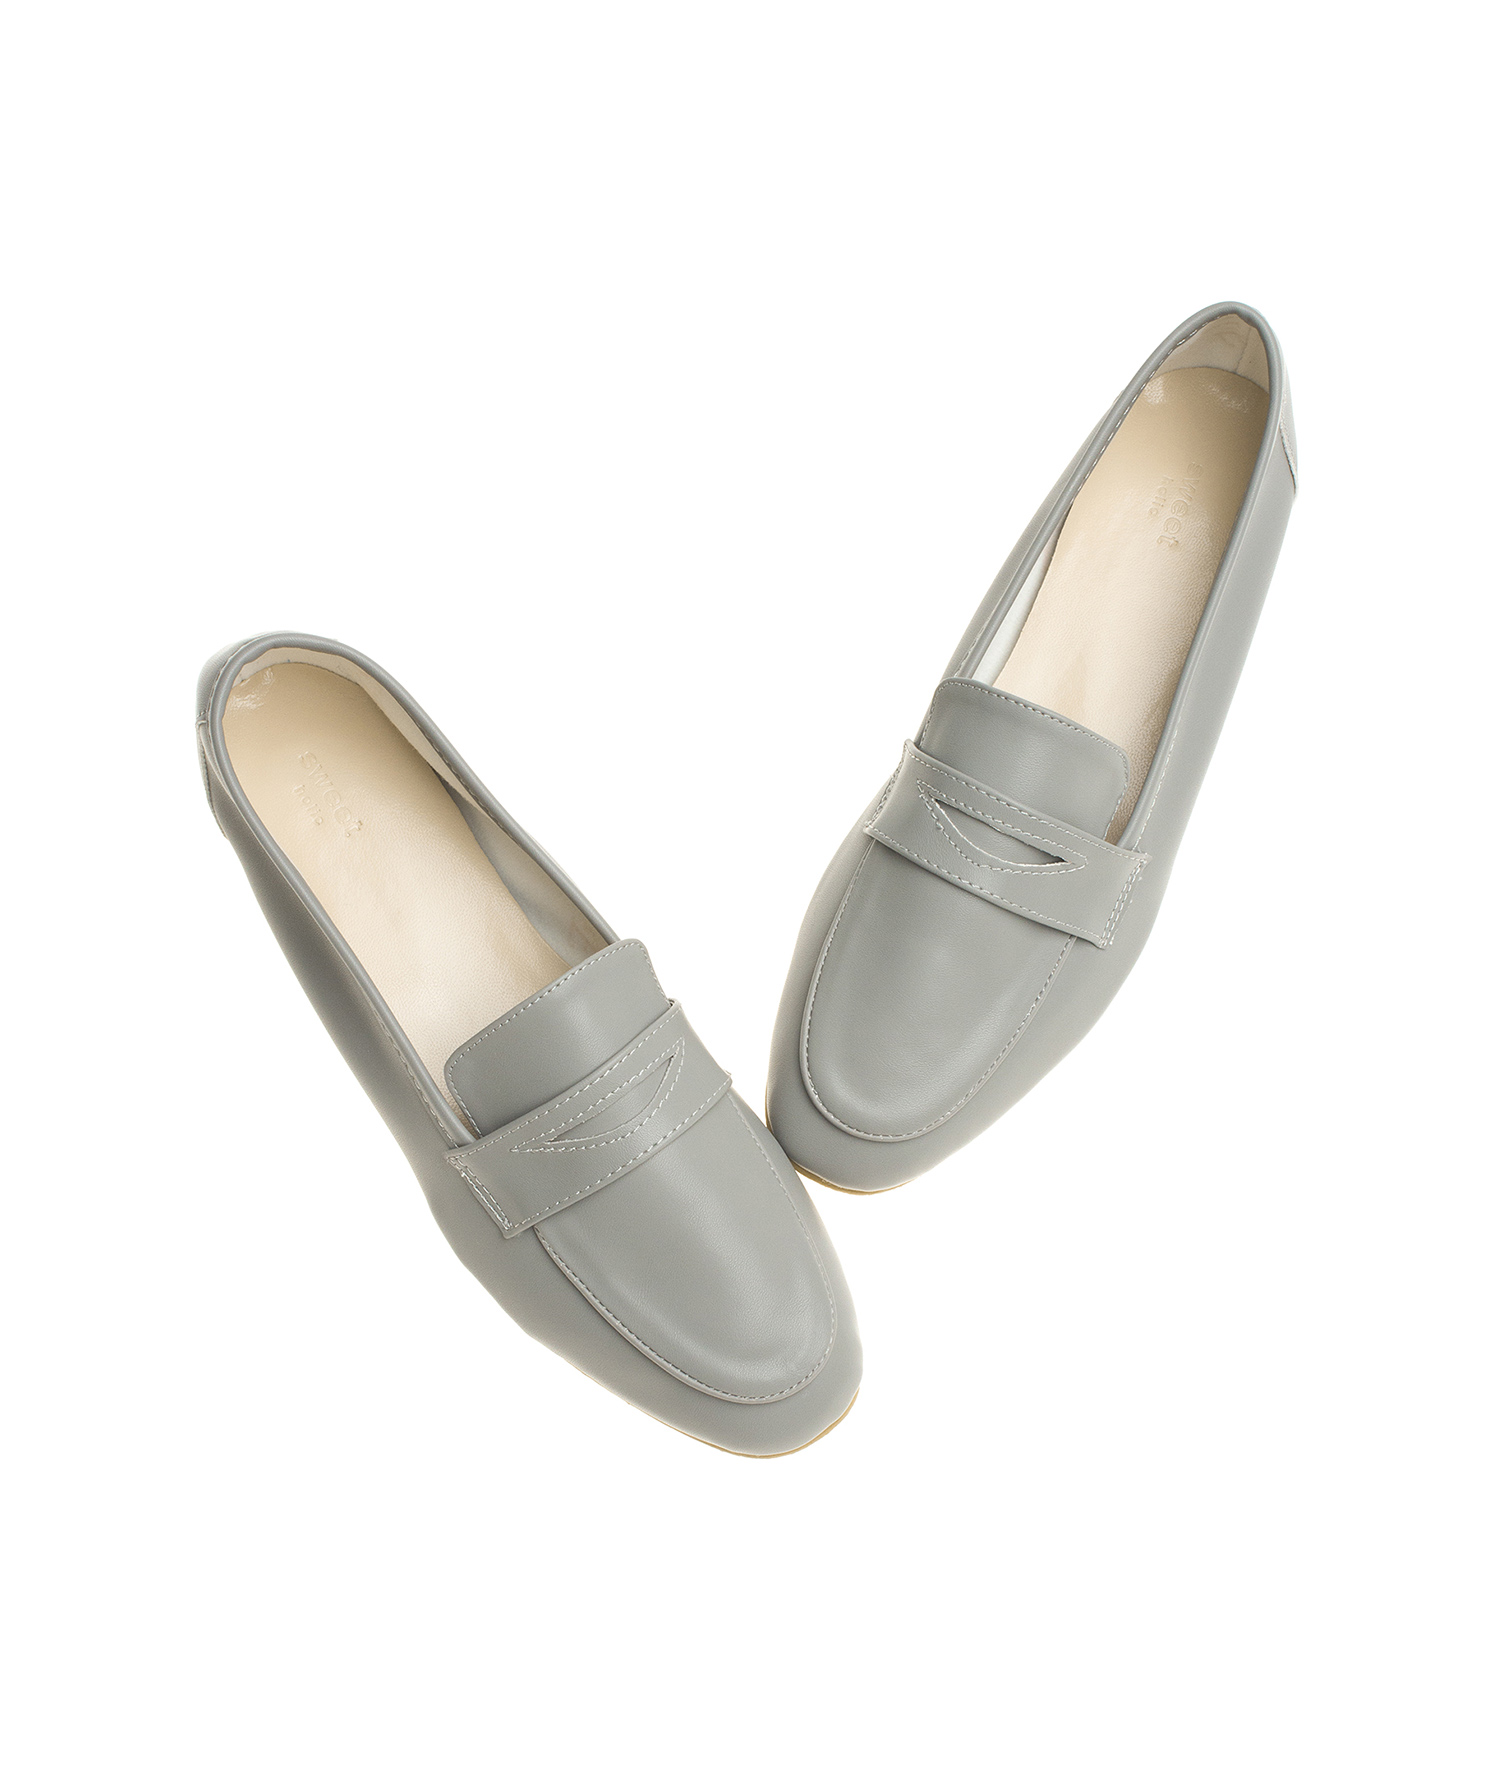 cc18ee7c40e AnnaKastle Womens Malva Vegan Leather Penny Loafers Gray